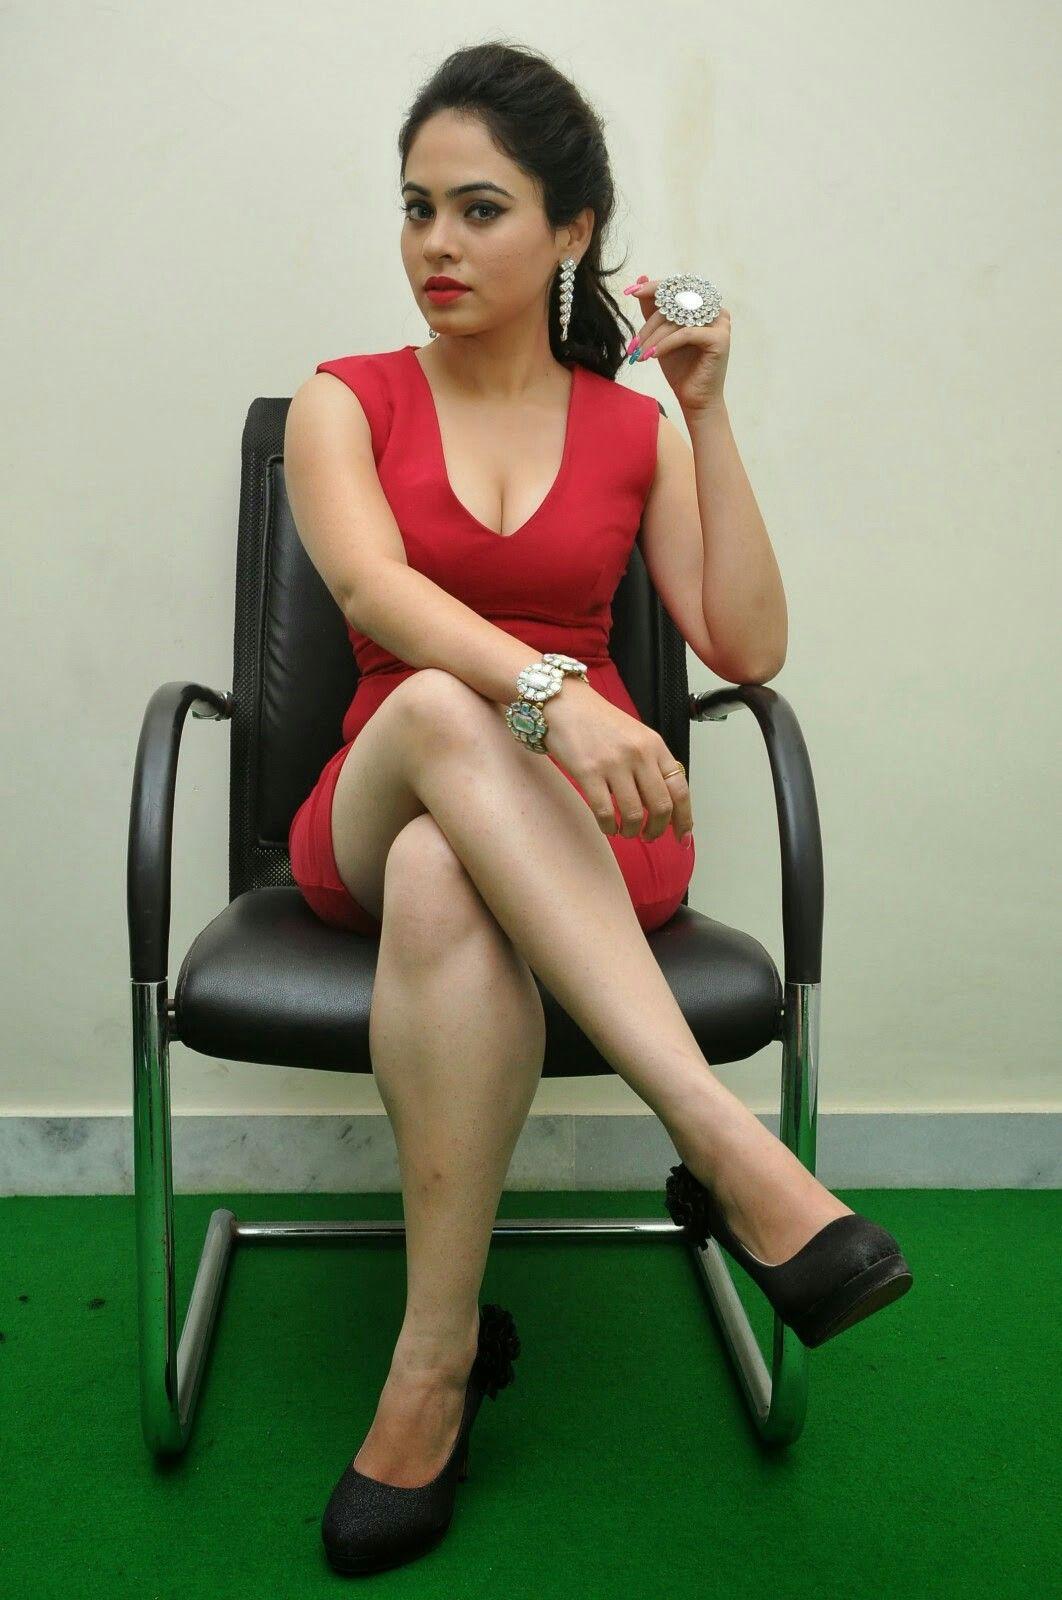 Hacked Nathalia Kaur nudes (17 photo), Ass, Bikini, Twitter, panties 2020